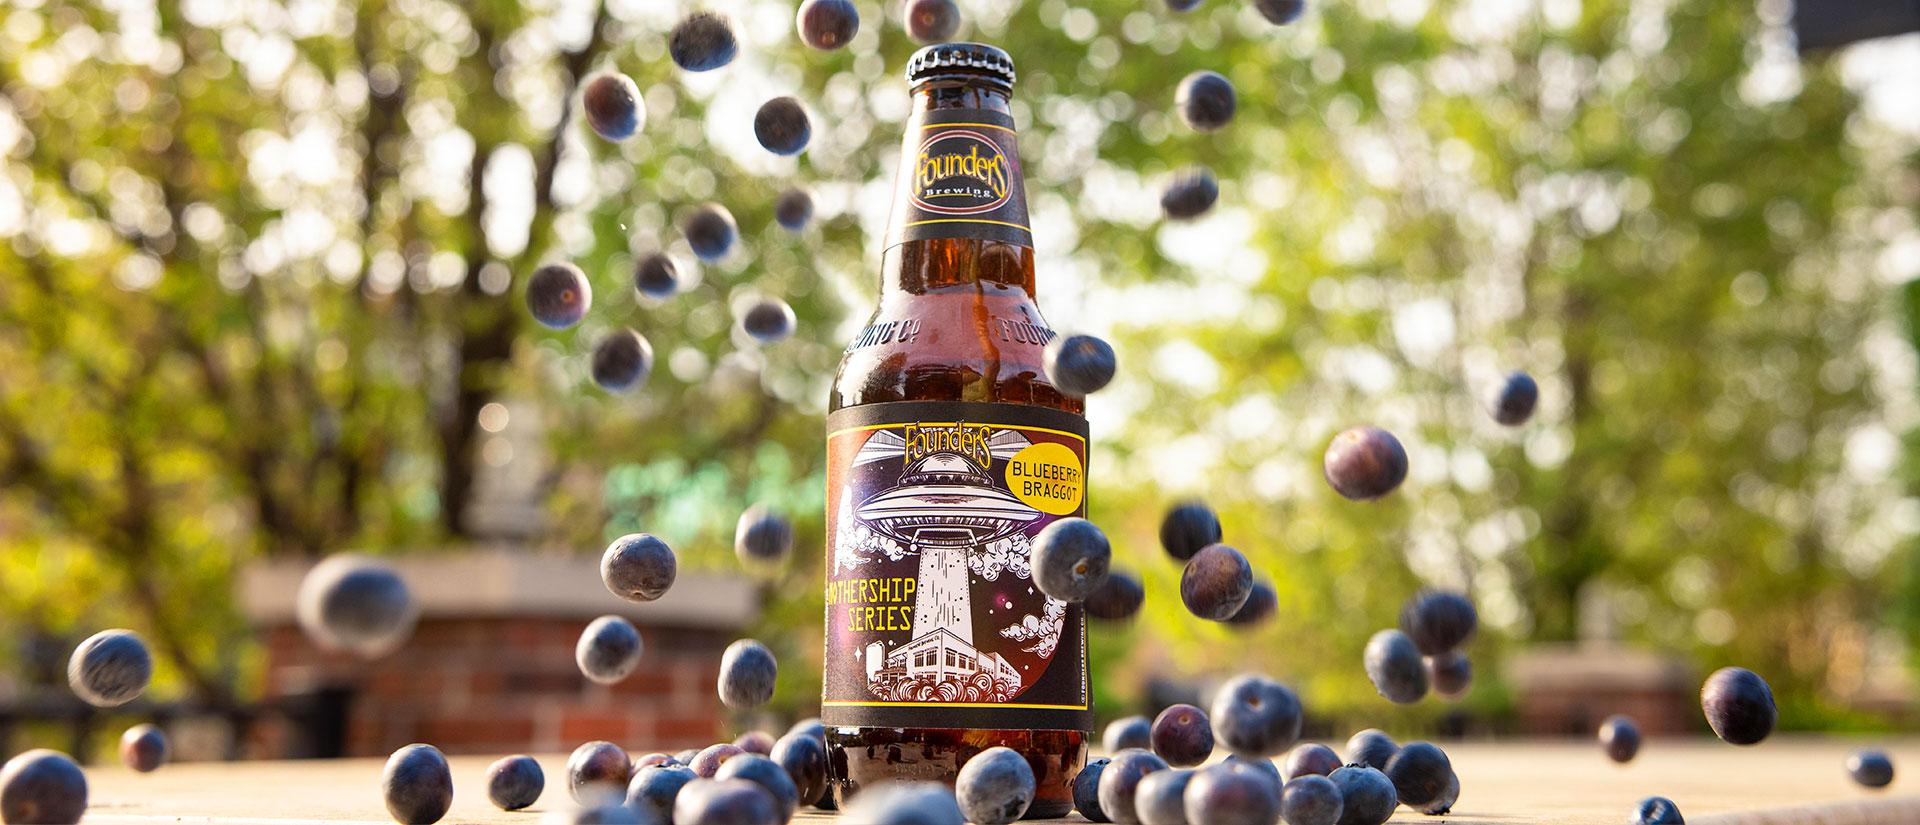 blueberry braggot announce 2021